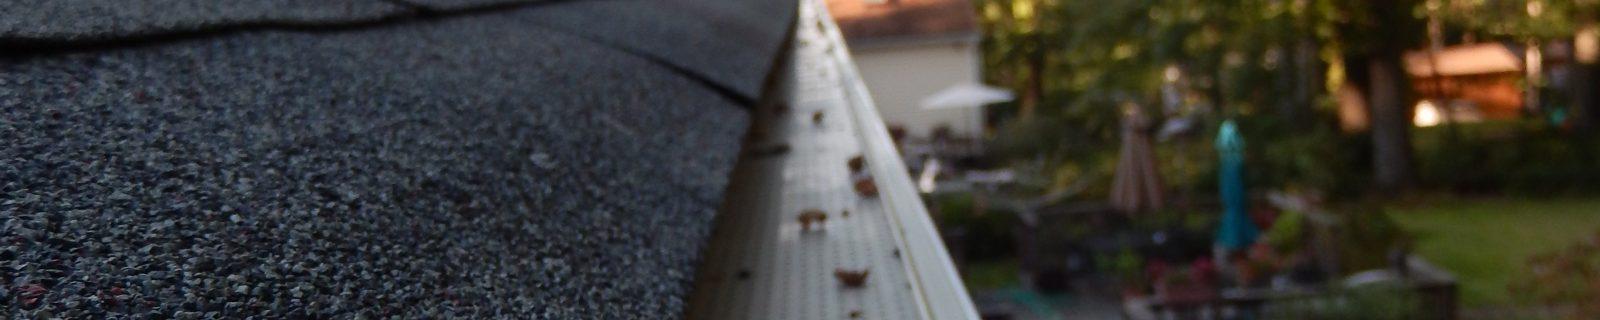 gutter guard leaf relief